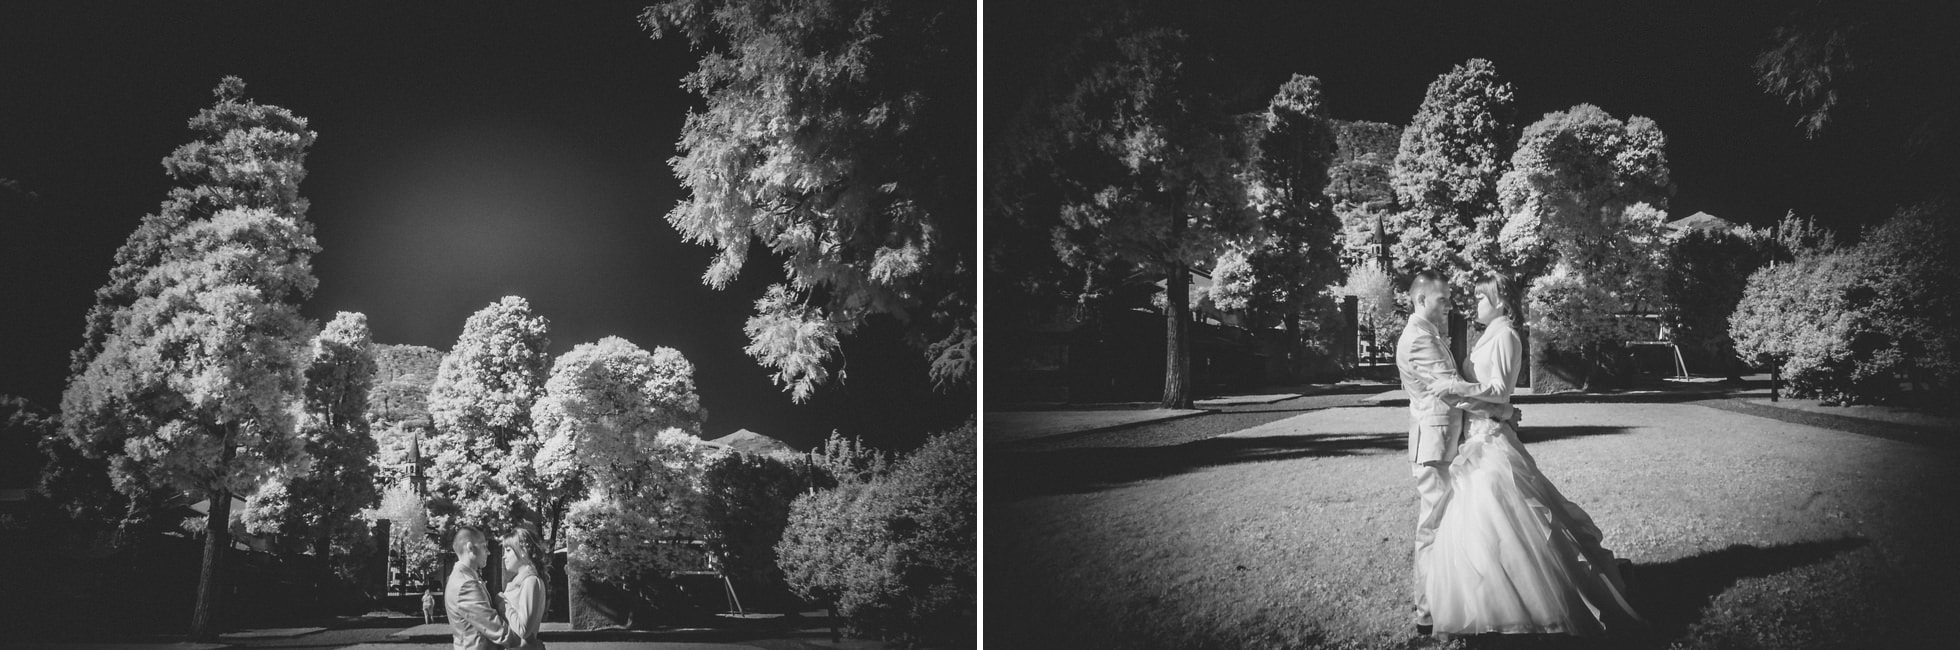 Fotografo matrimonio gravedona infrarosso